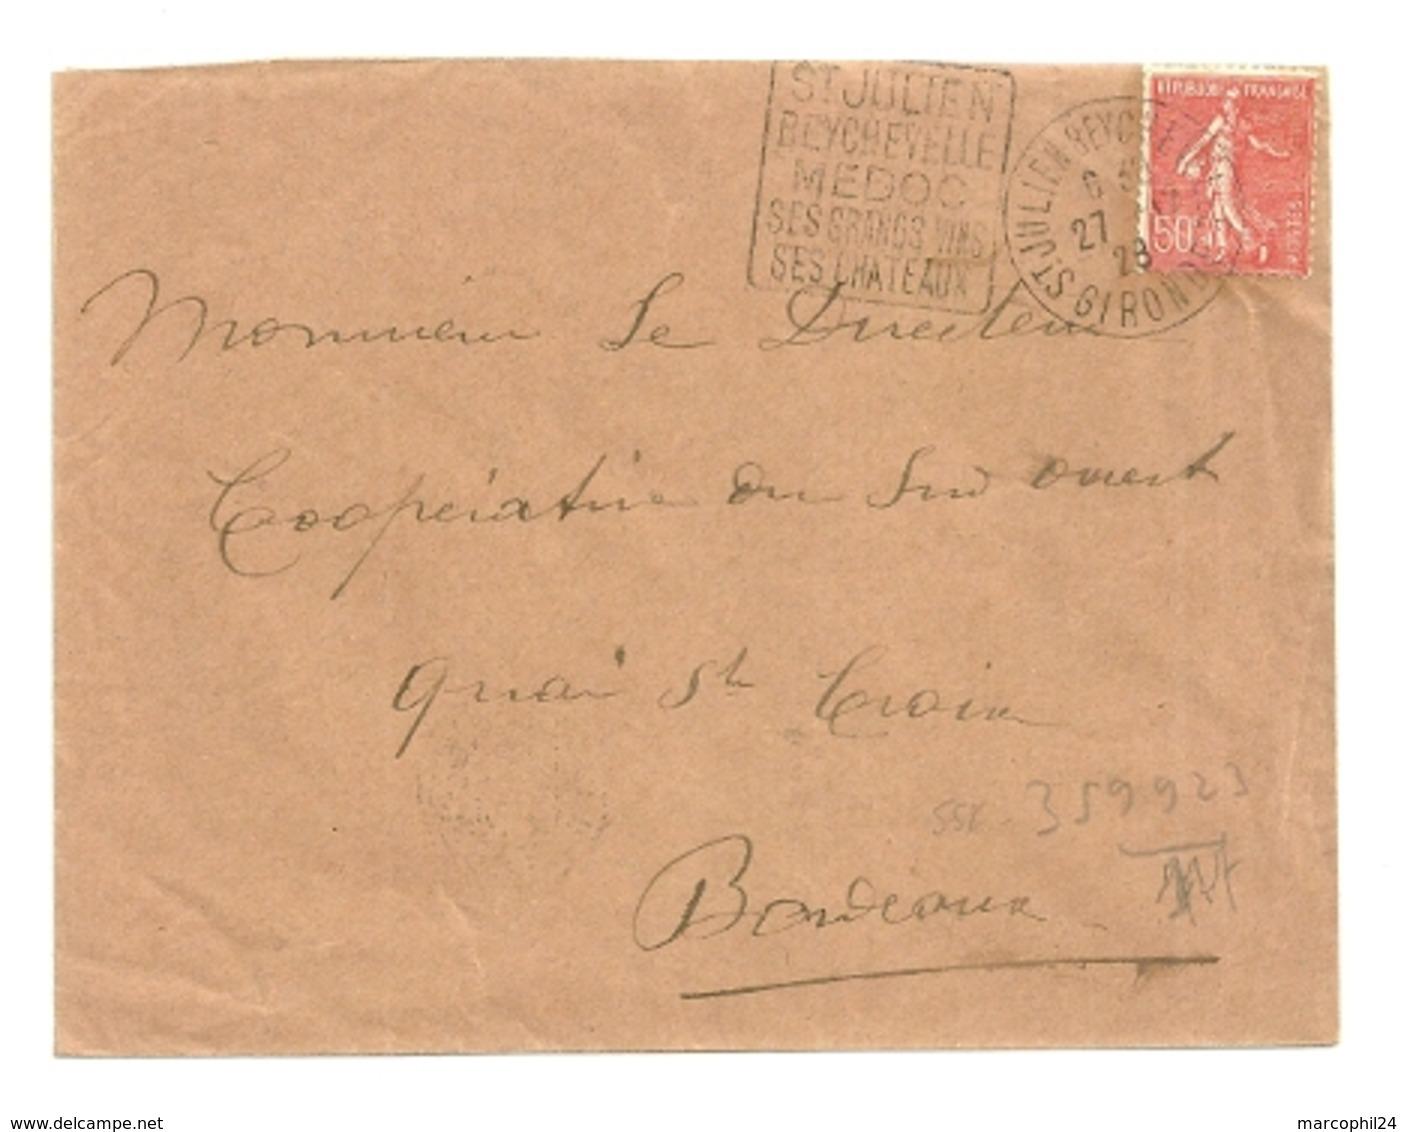 GIRONDE - Dépt N° 33 = St JULIEN BEYCHEVELLE 1928 = Flamme Thème VIN = DAGUIN ' MEDOC / GRANDS VINS /CHATEAUX ' - Poststempel (Briefe)